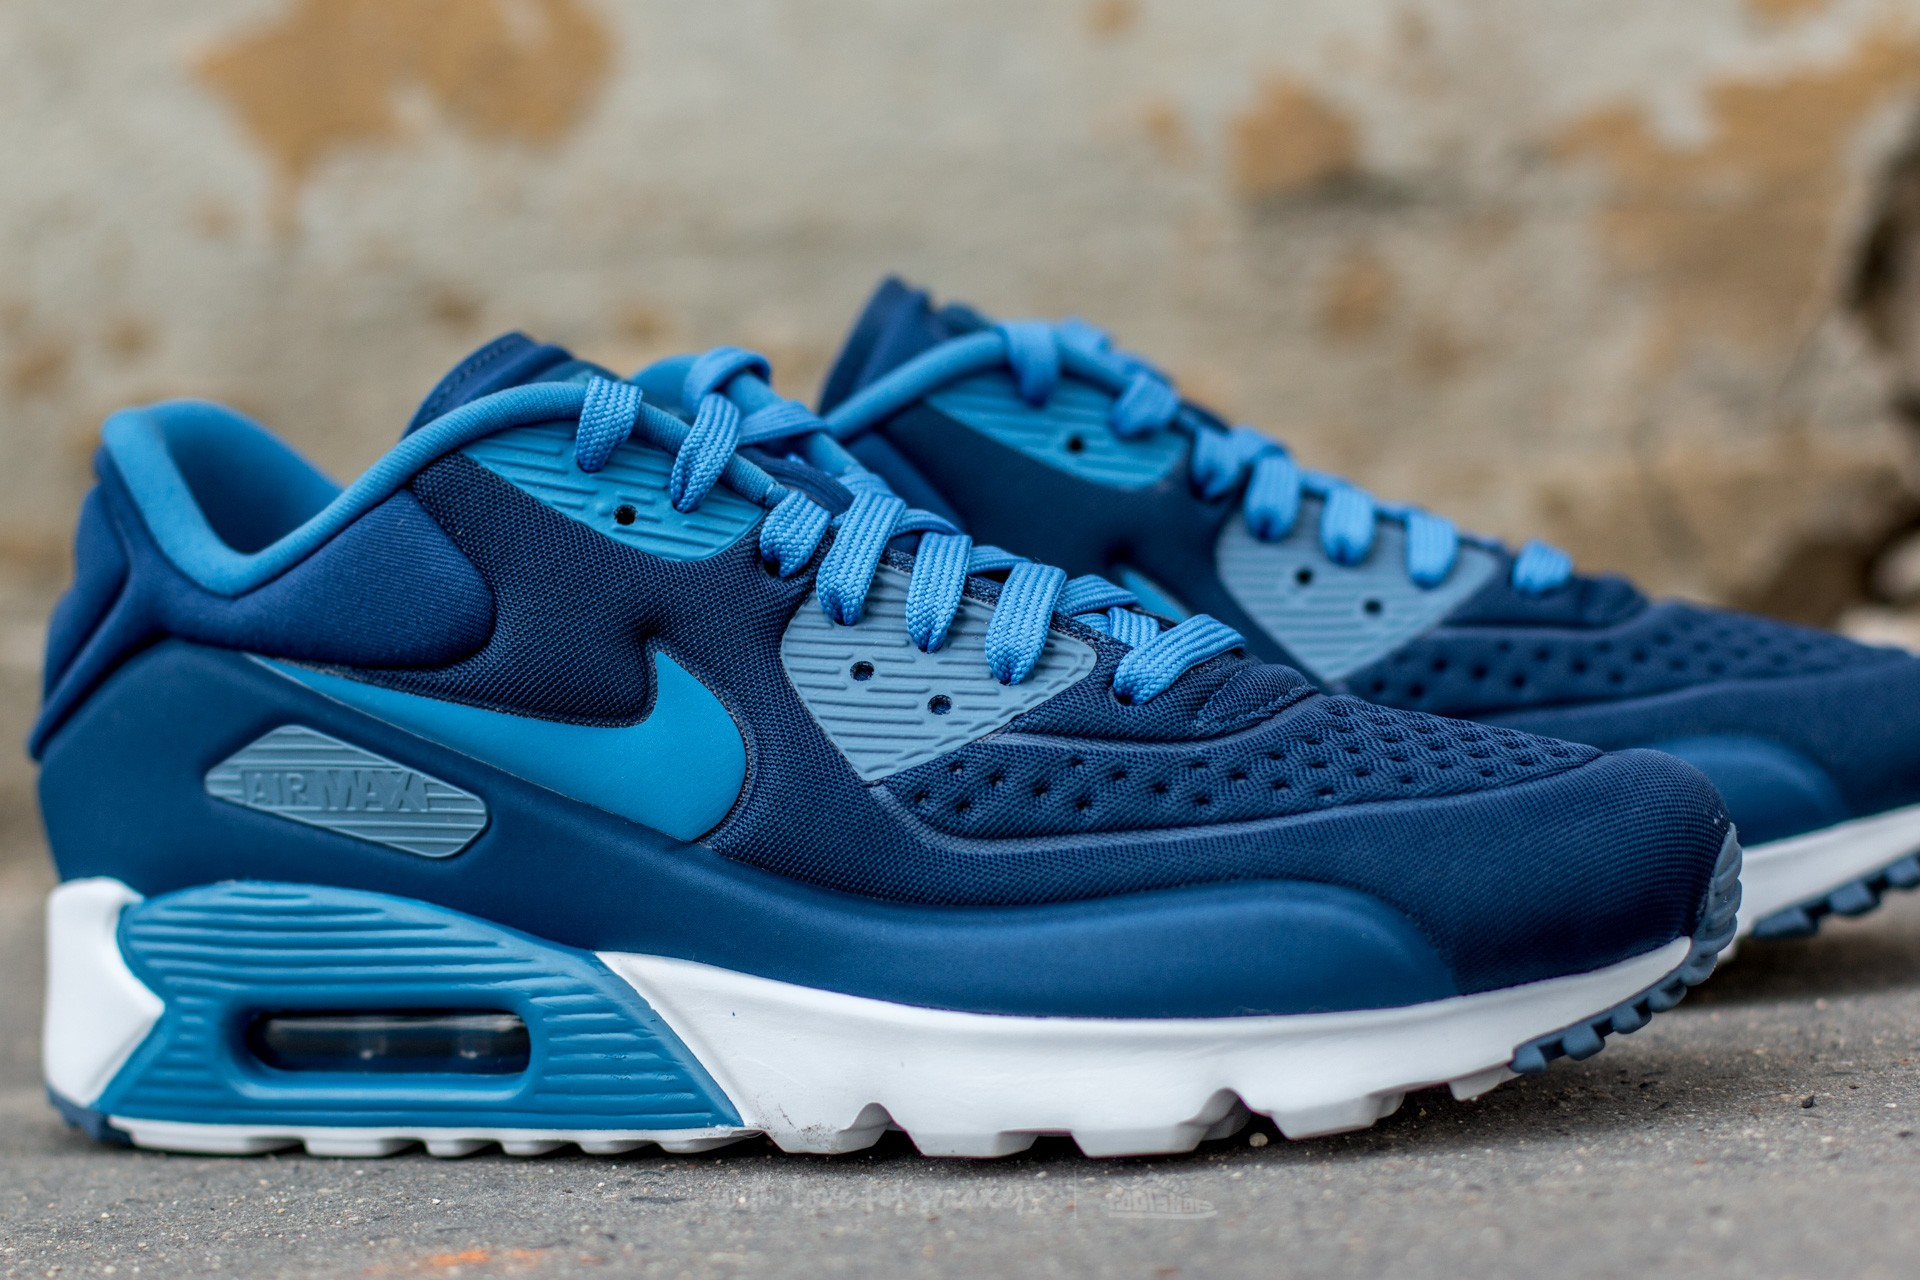 Nike Air Max 90 Ultra SE Coastal Blue Star Blue Ocean Fog White | Footshop